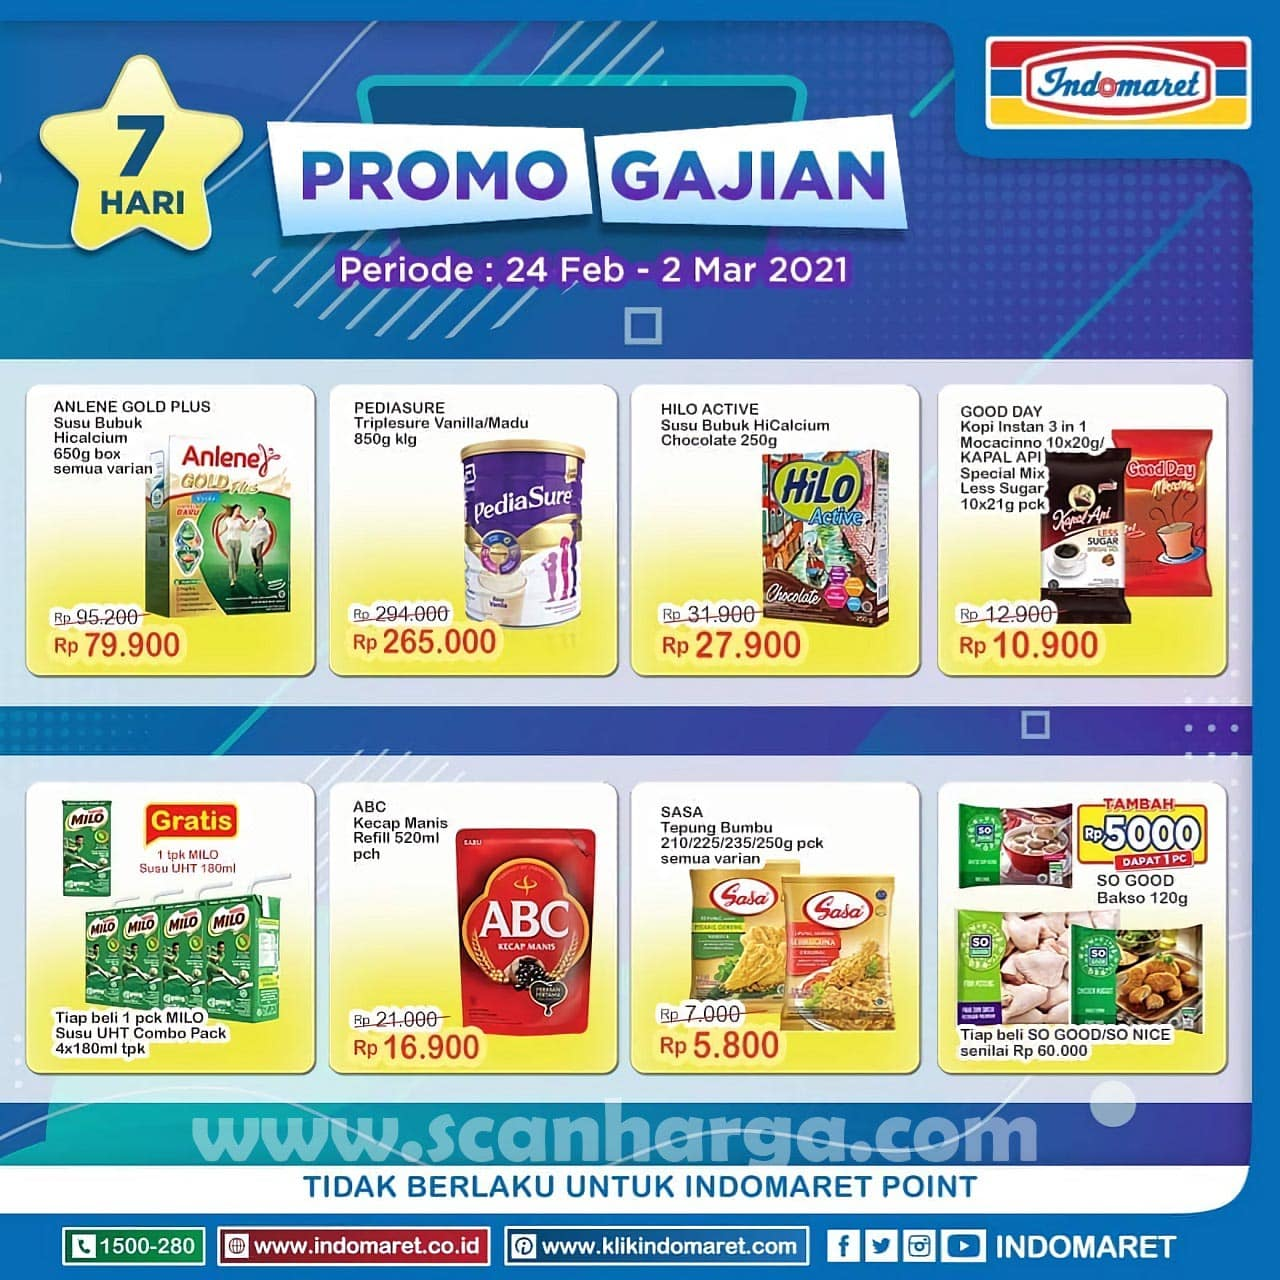 INDOMARET Promo GAJIAN Periode 24 Februari - 2 Maret 2021 1